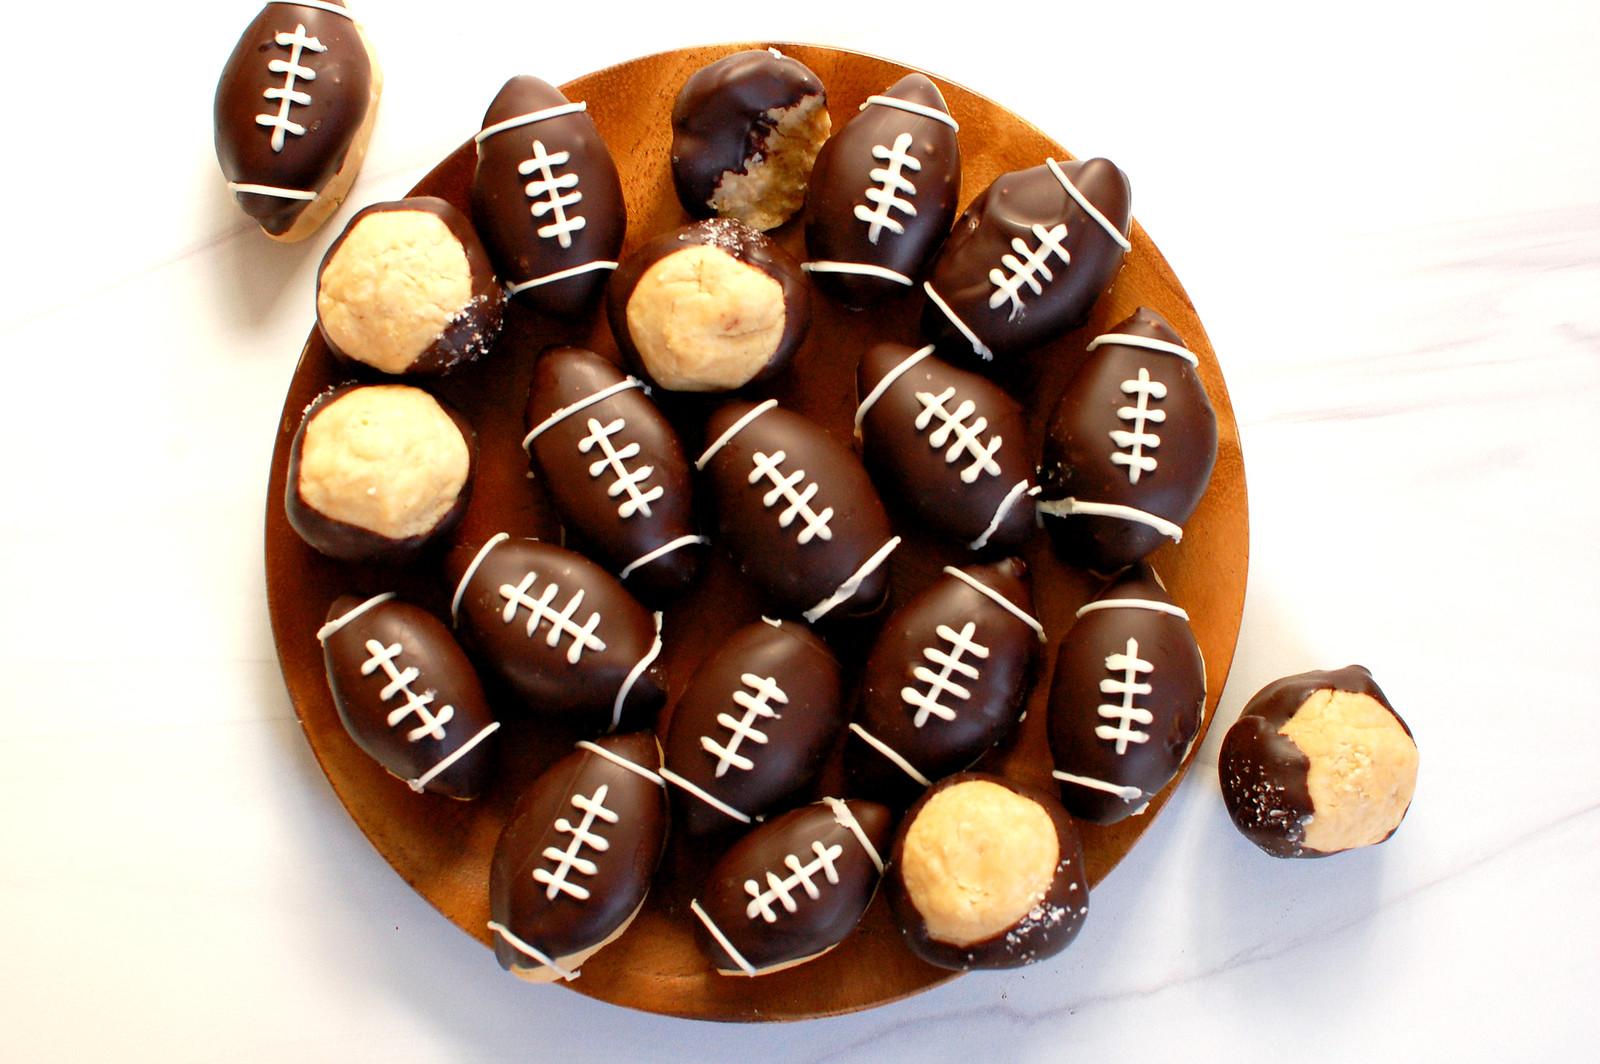 super bowl dessert football buckeyes chocolate peanut butter on plate